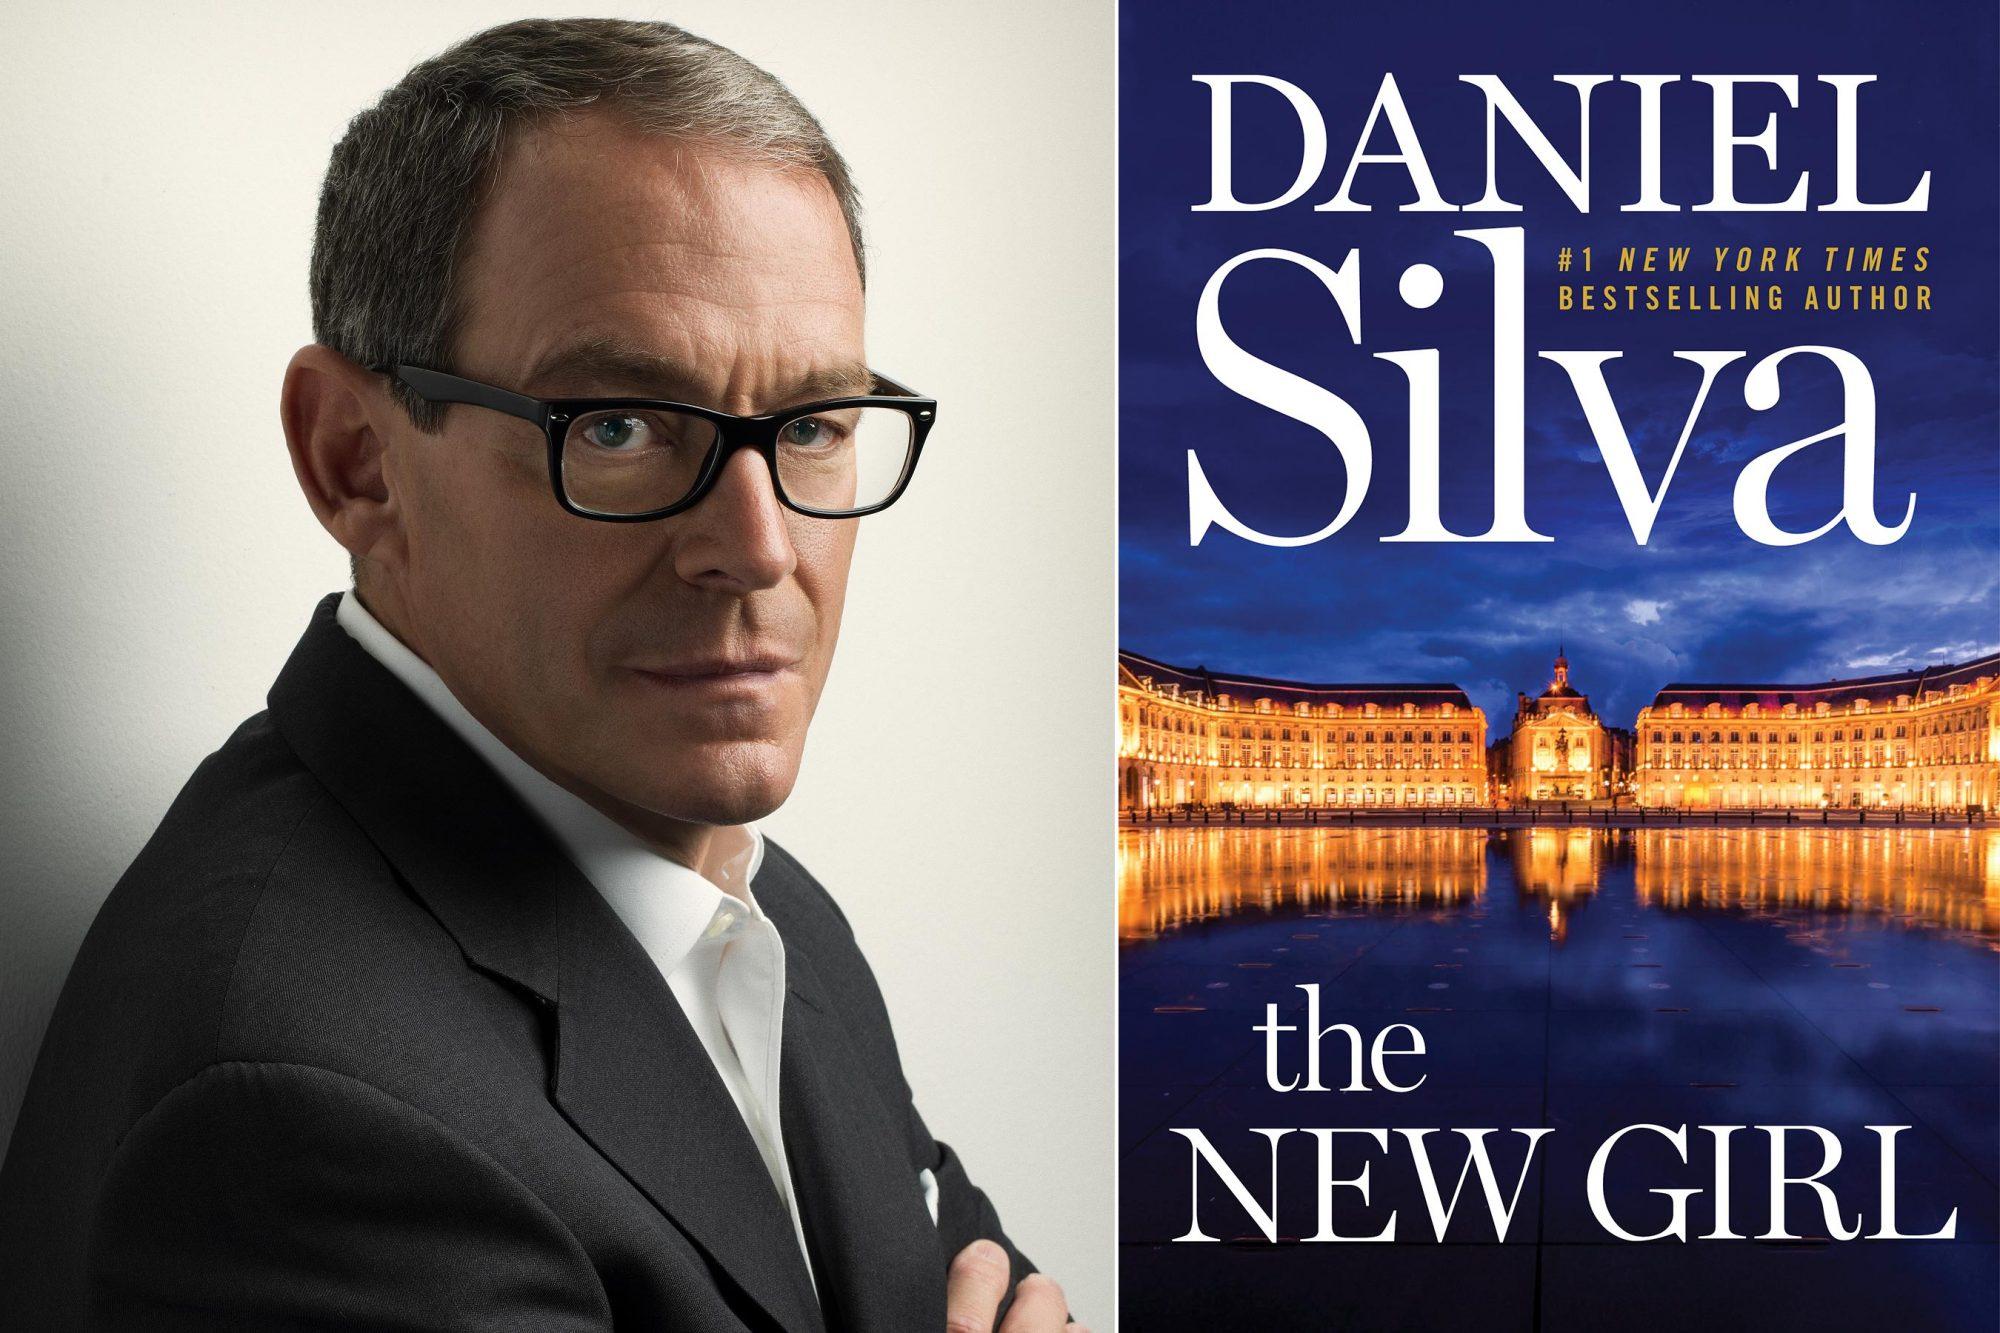 Daniel Silva author photo Photo credit: Marco Grob The New Girl by Daniel Silva CR: HarperCollins